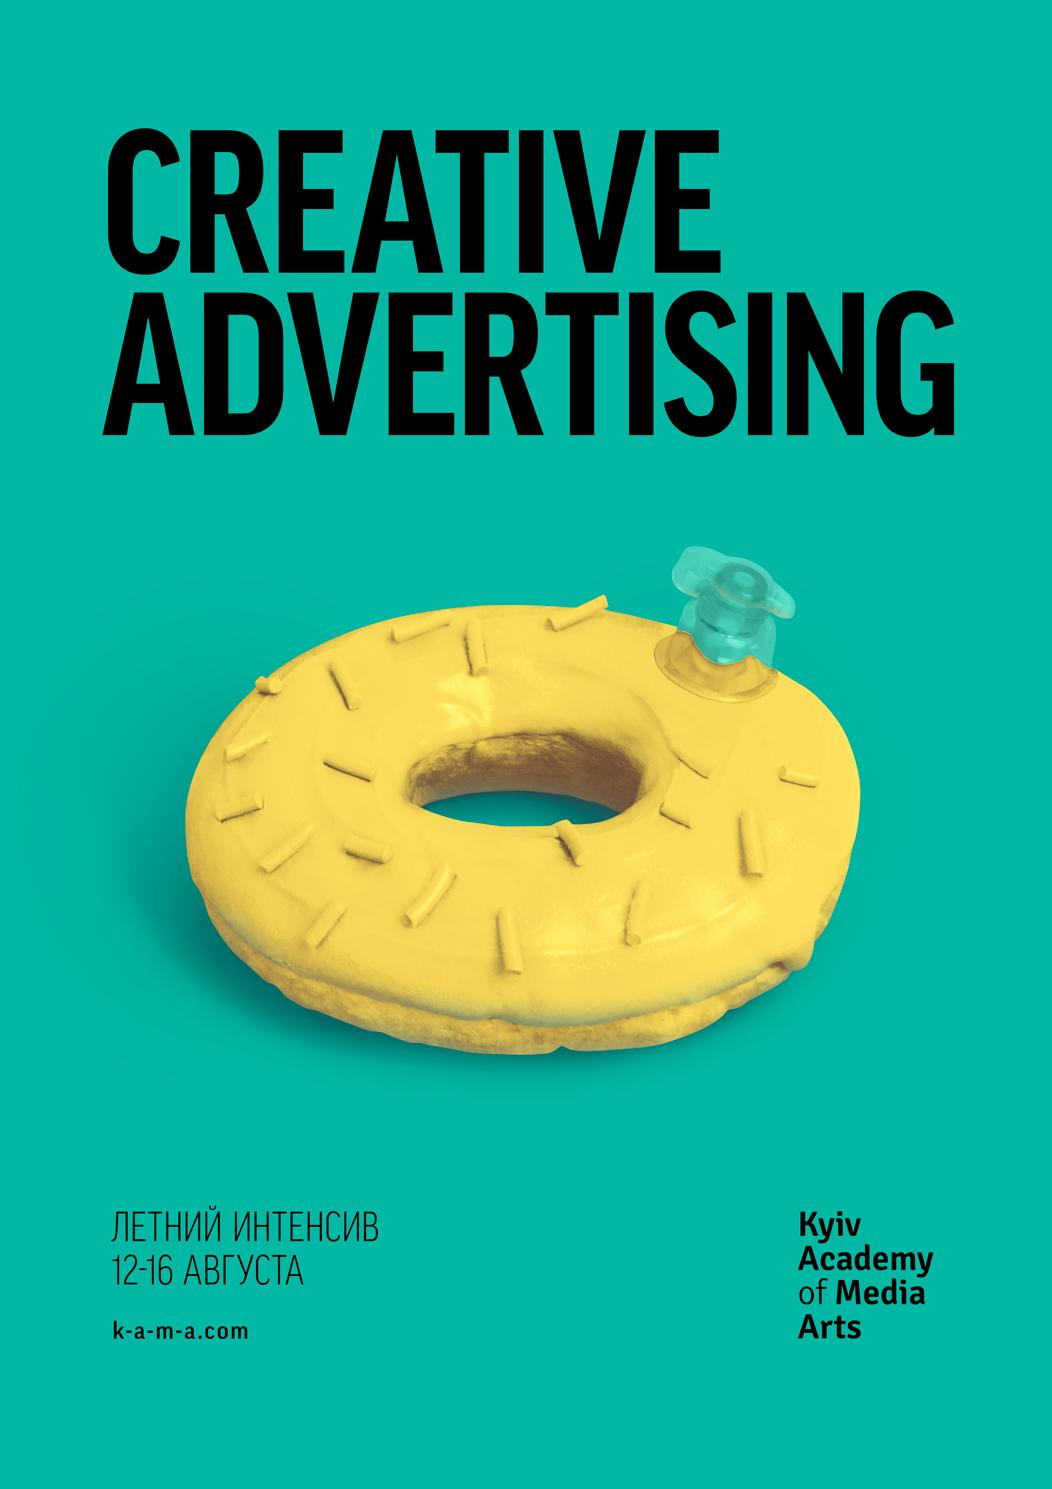 CREATIVE-ADVERTISING-WEB (1).png